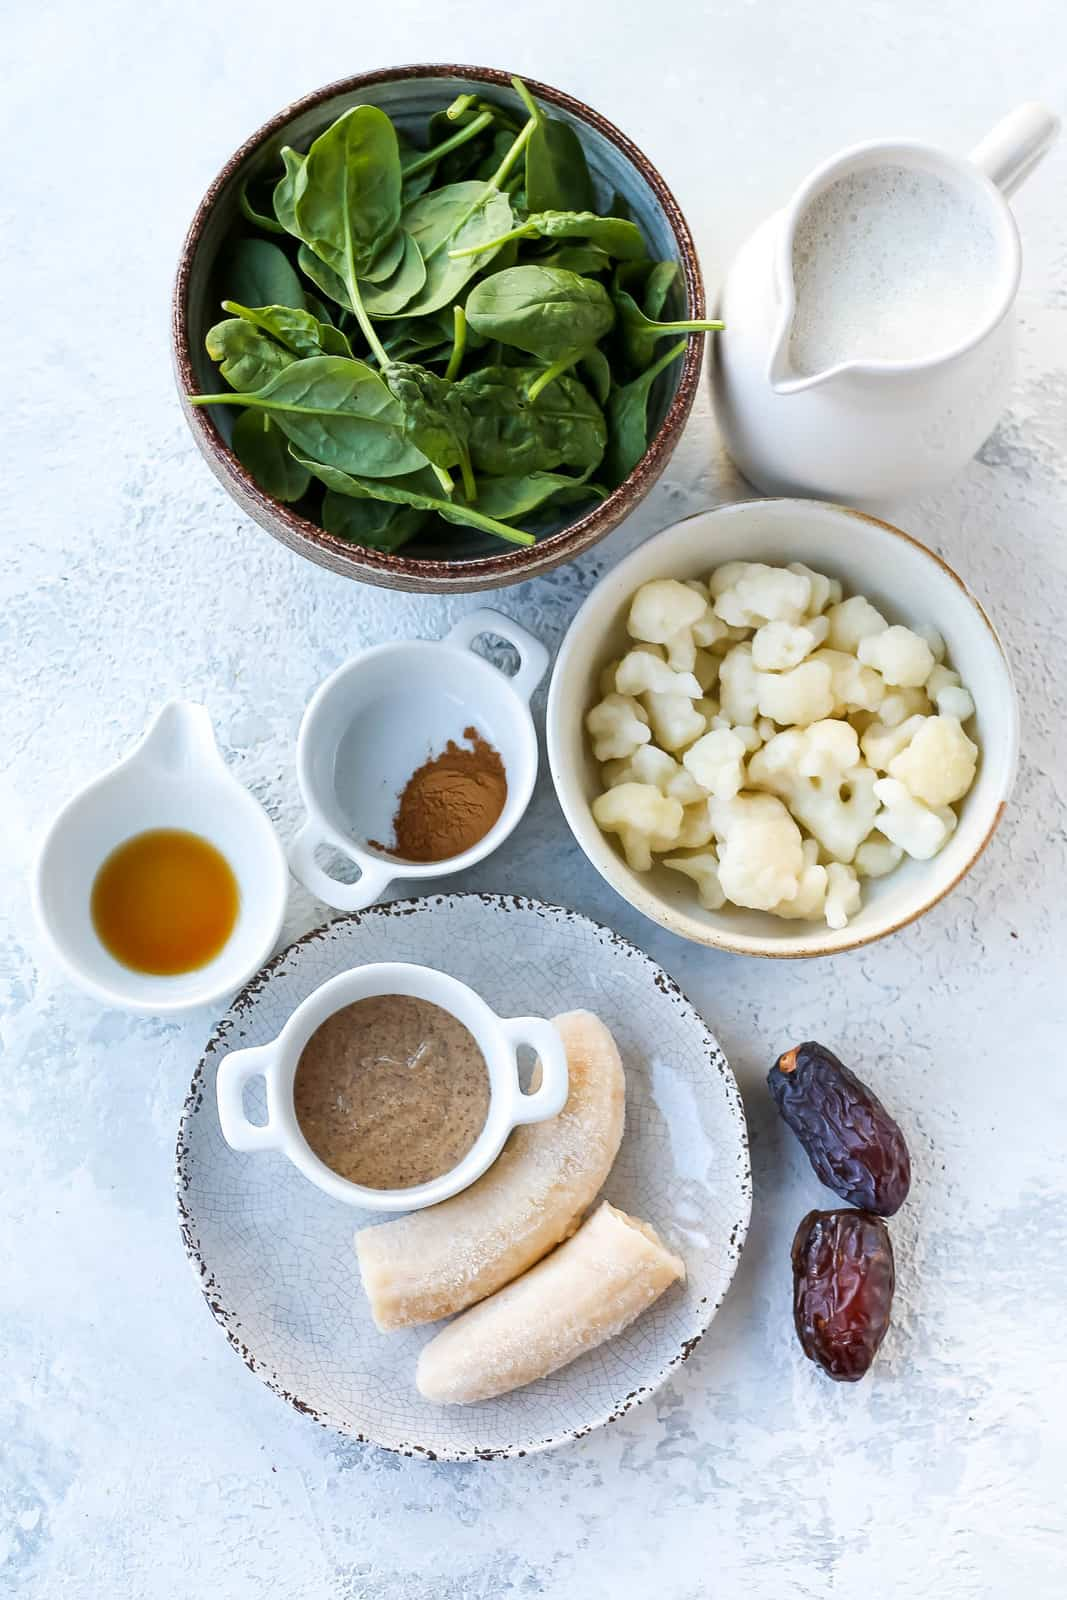 spinach, oat milk, frozen cauliflower, cinnamon, vanilla, almond butter, frozen banana, and dates on a grey background